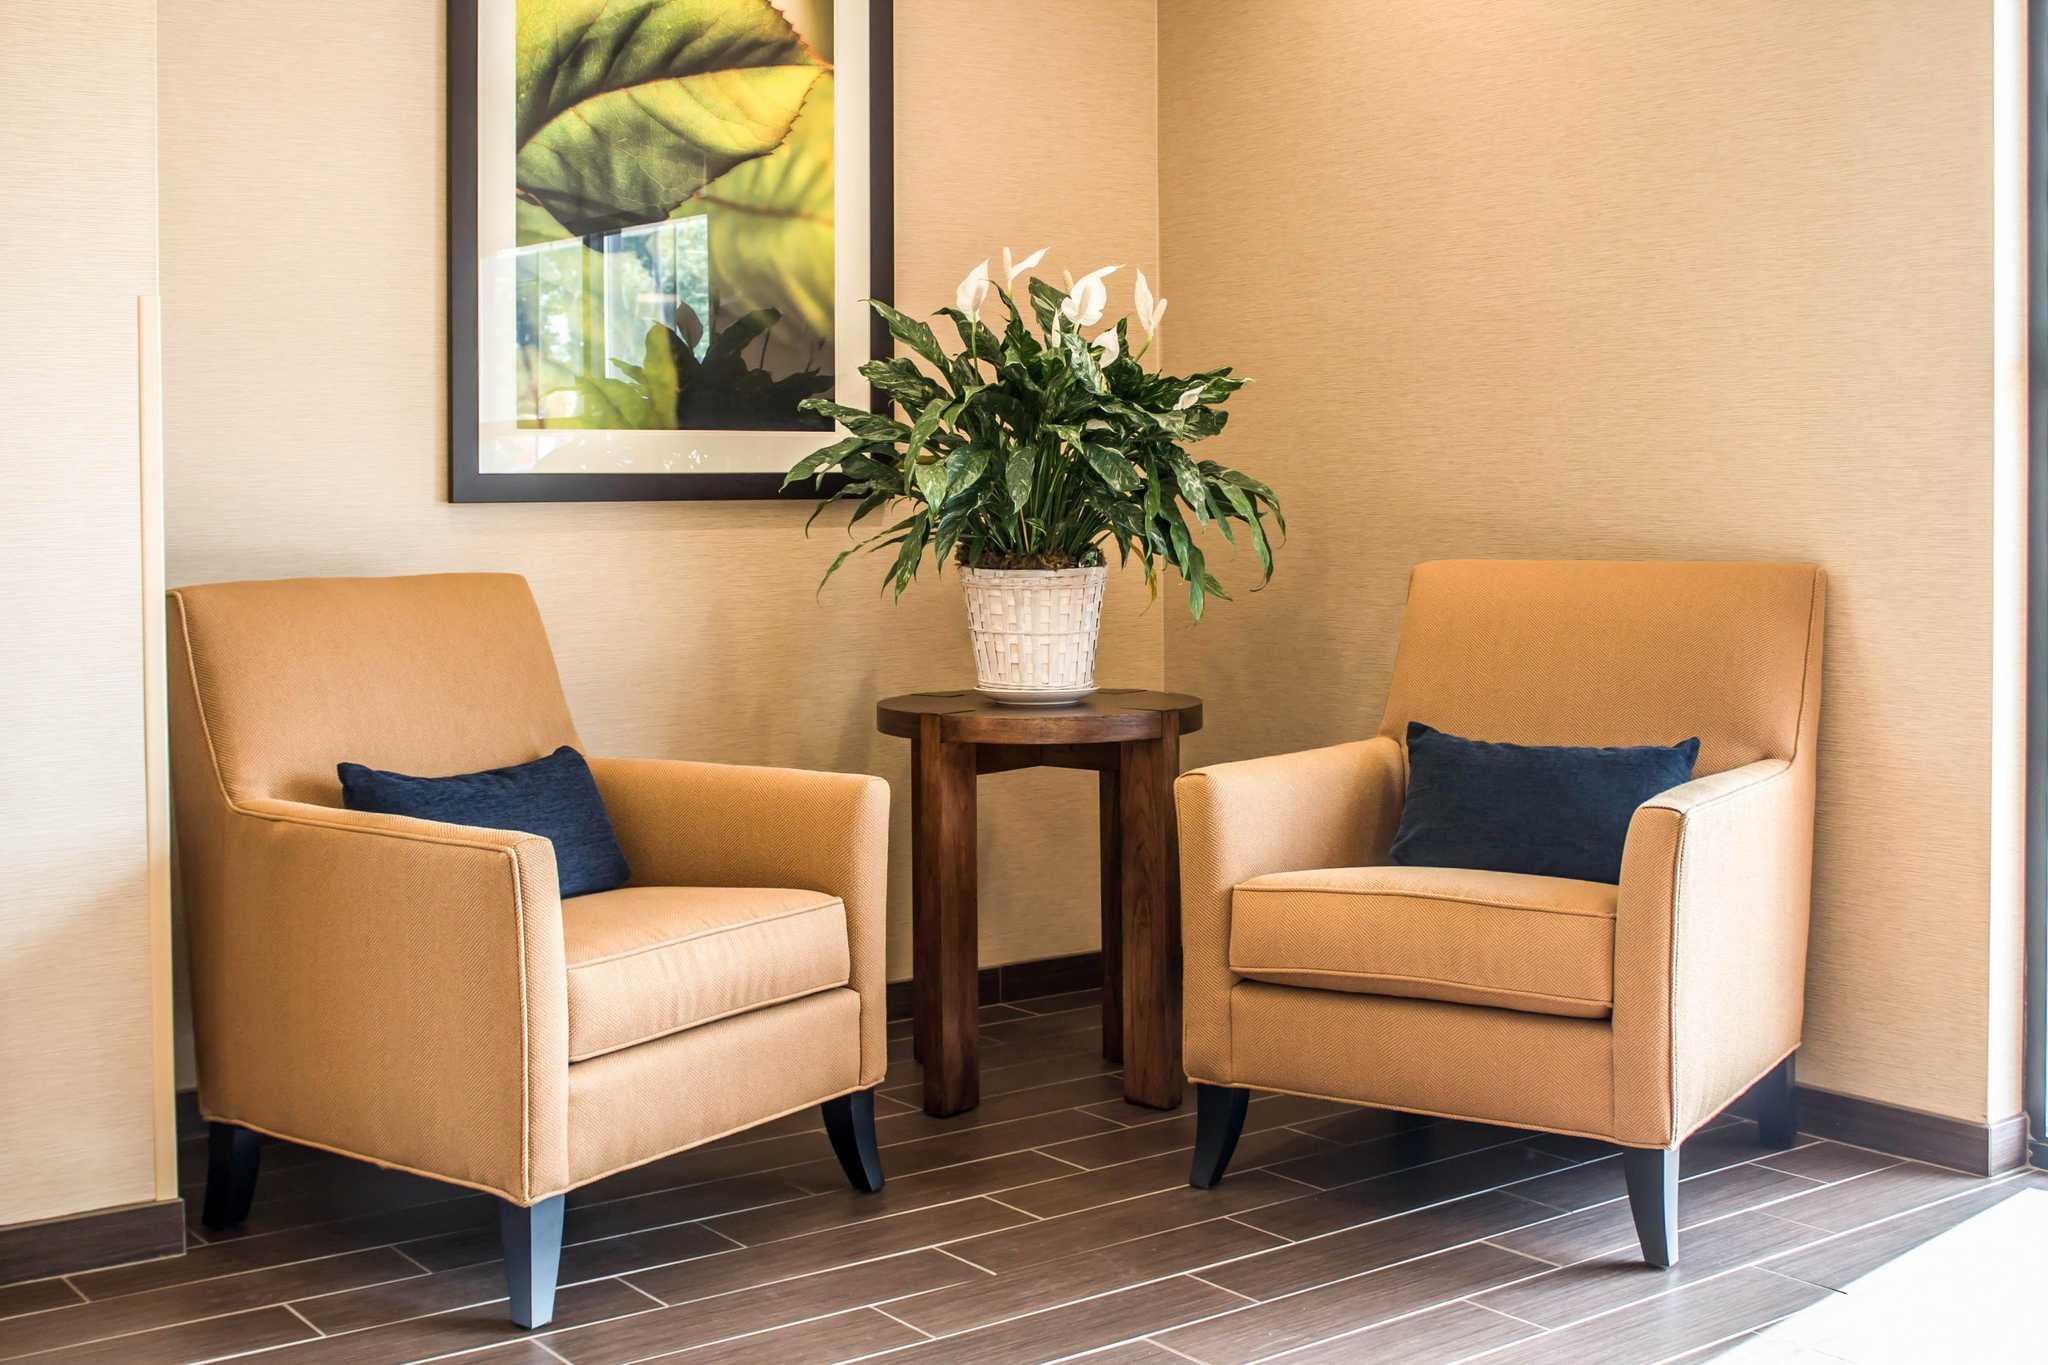 Comfort Suites image 7